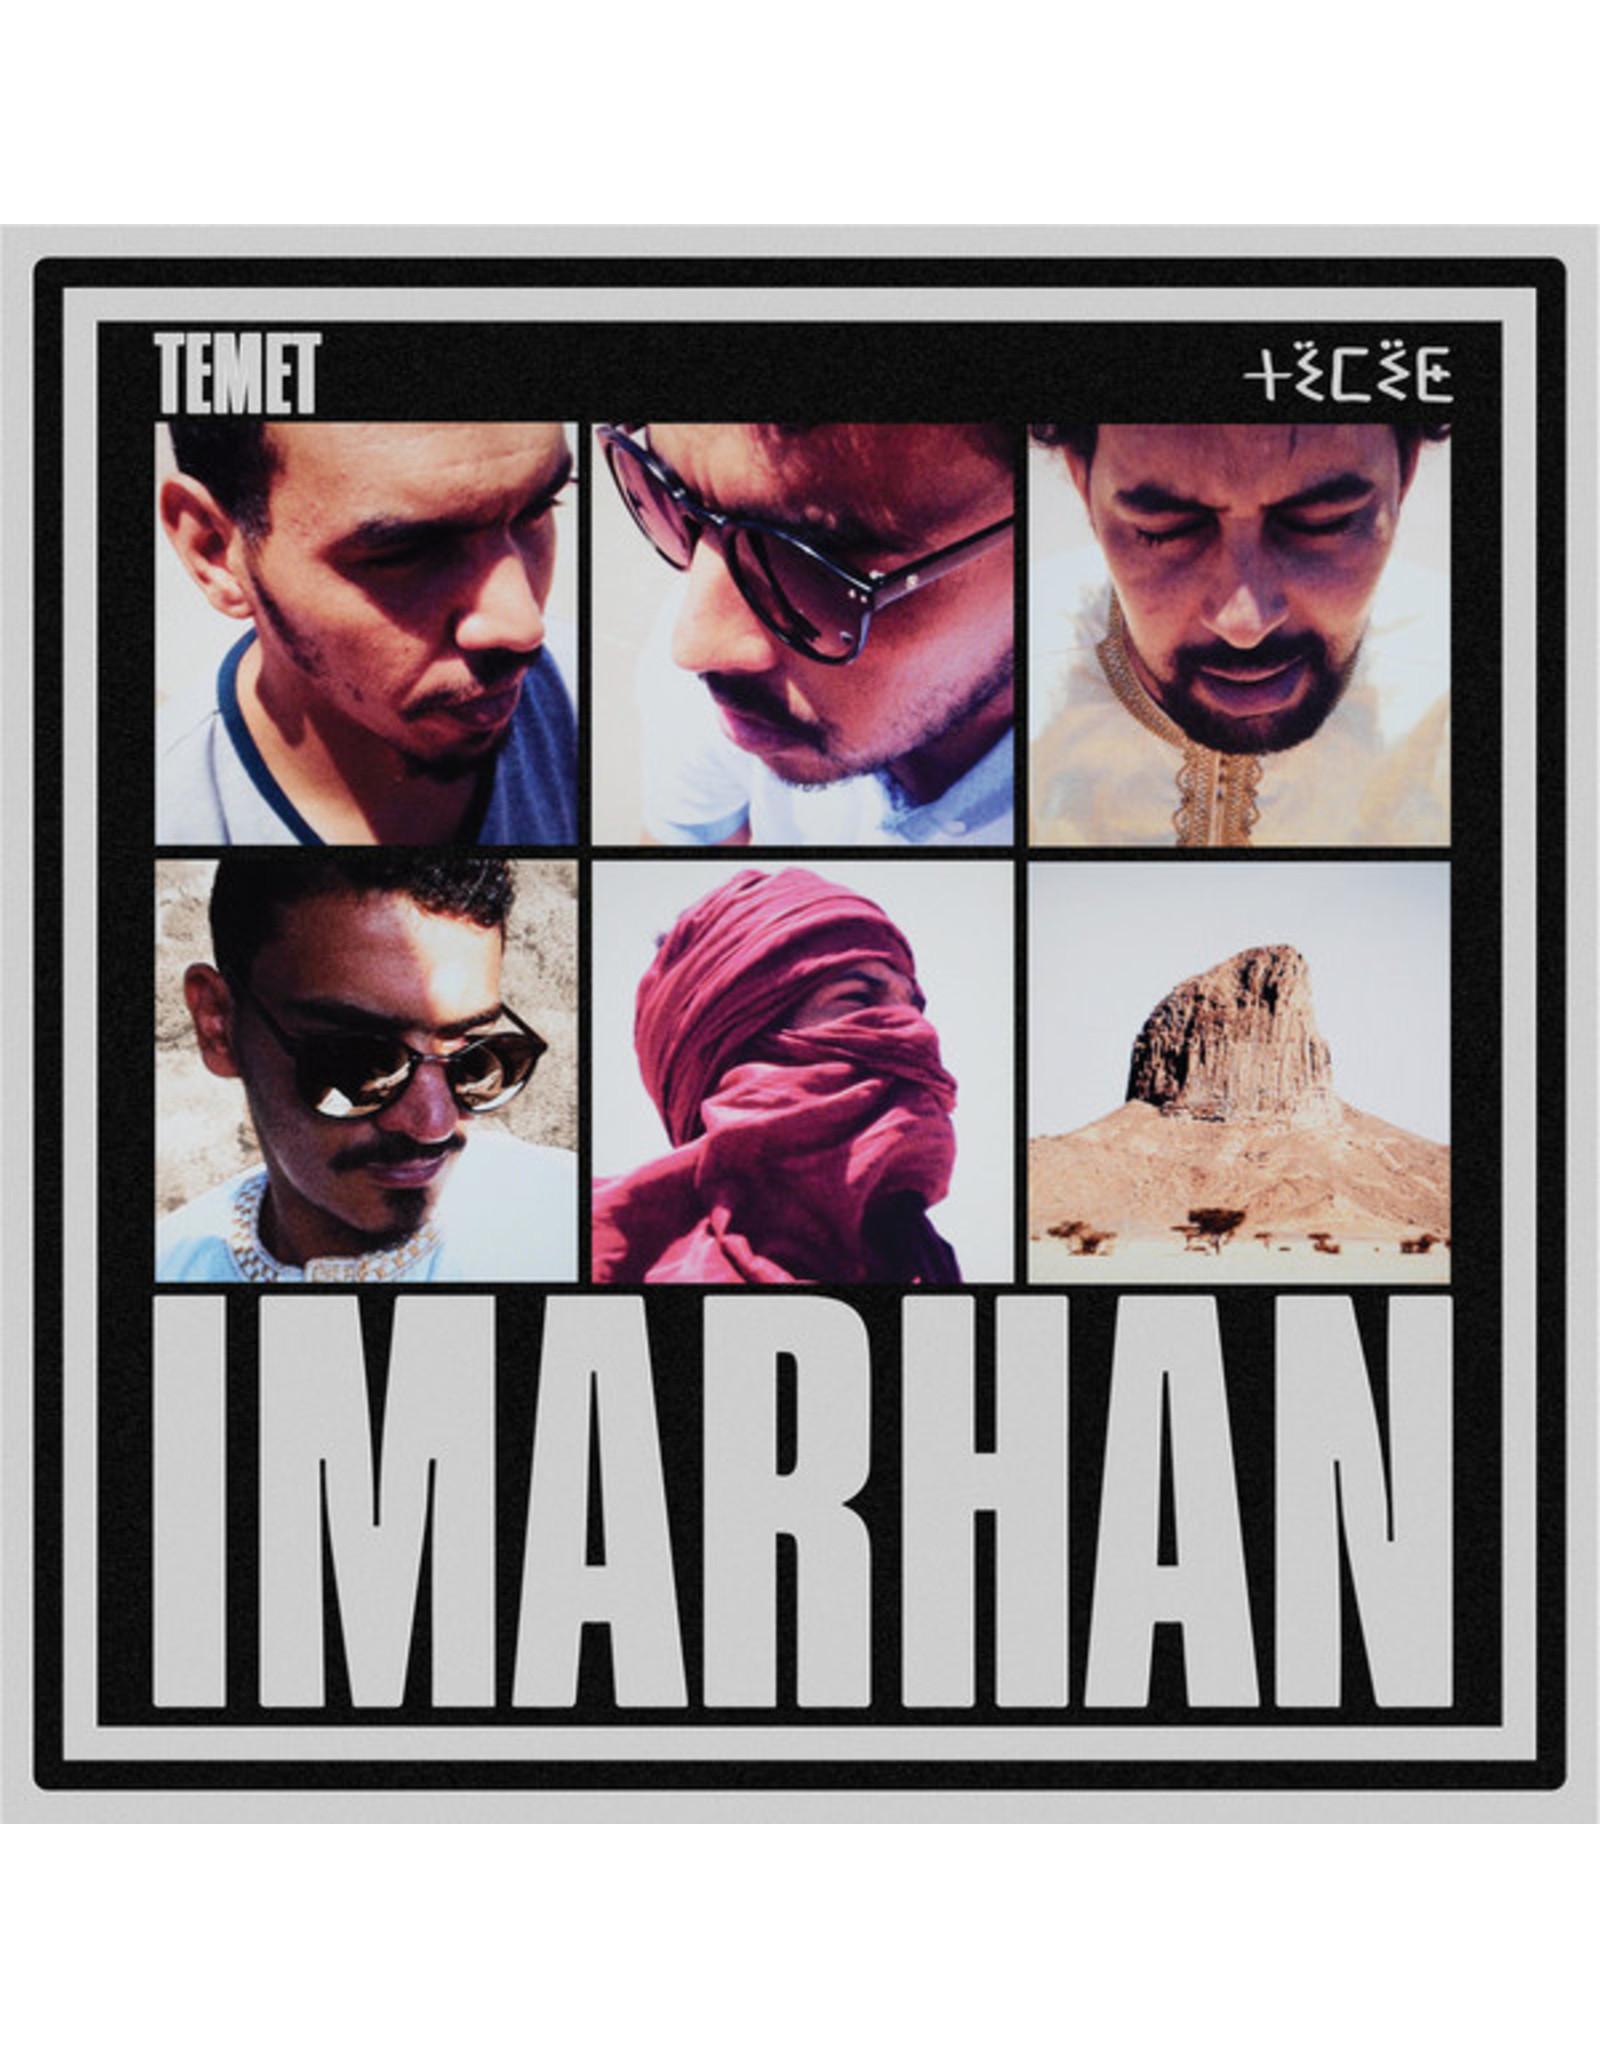 New Vinyl Imarhan - Temet LP